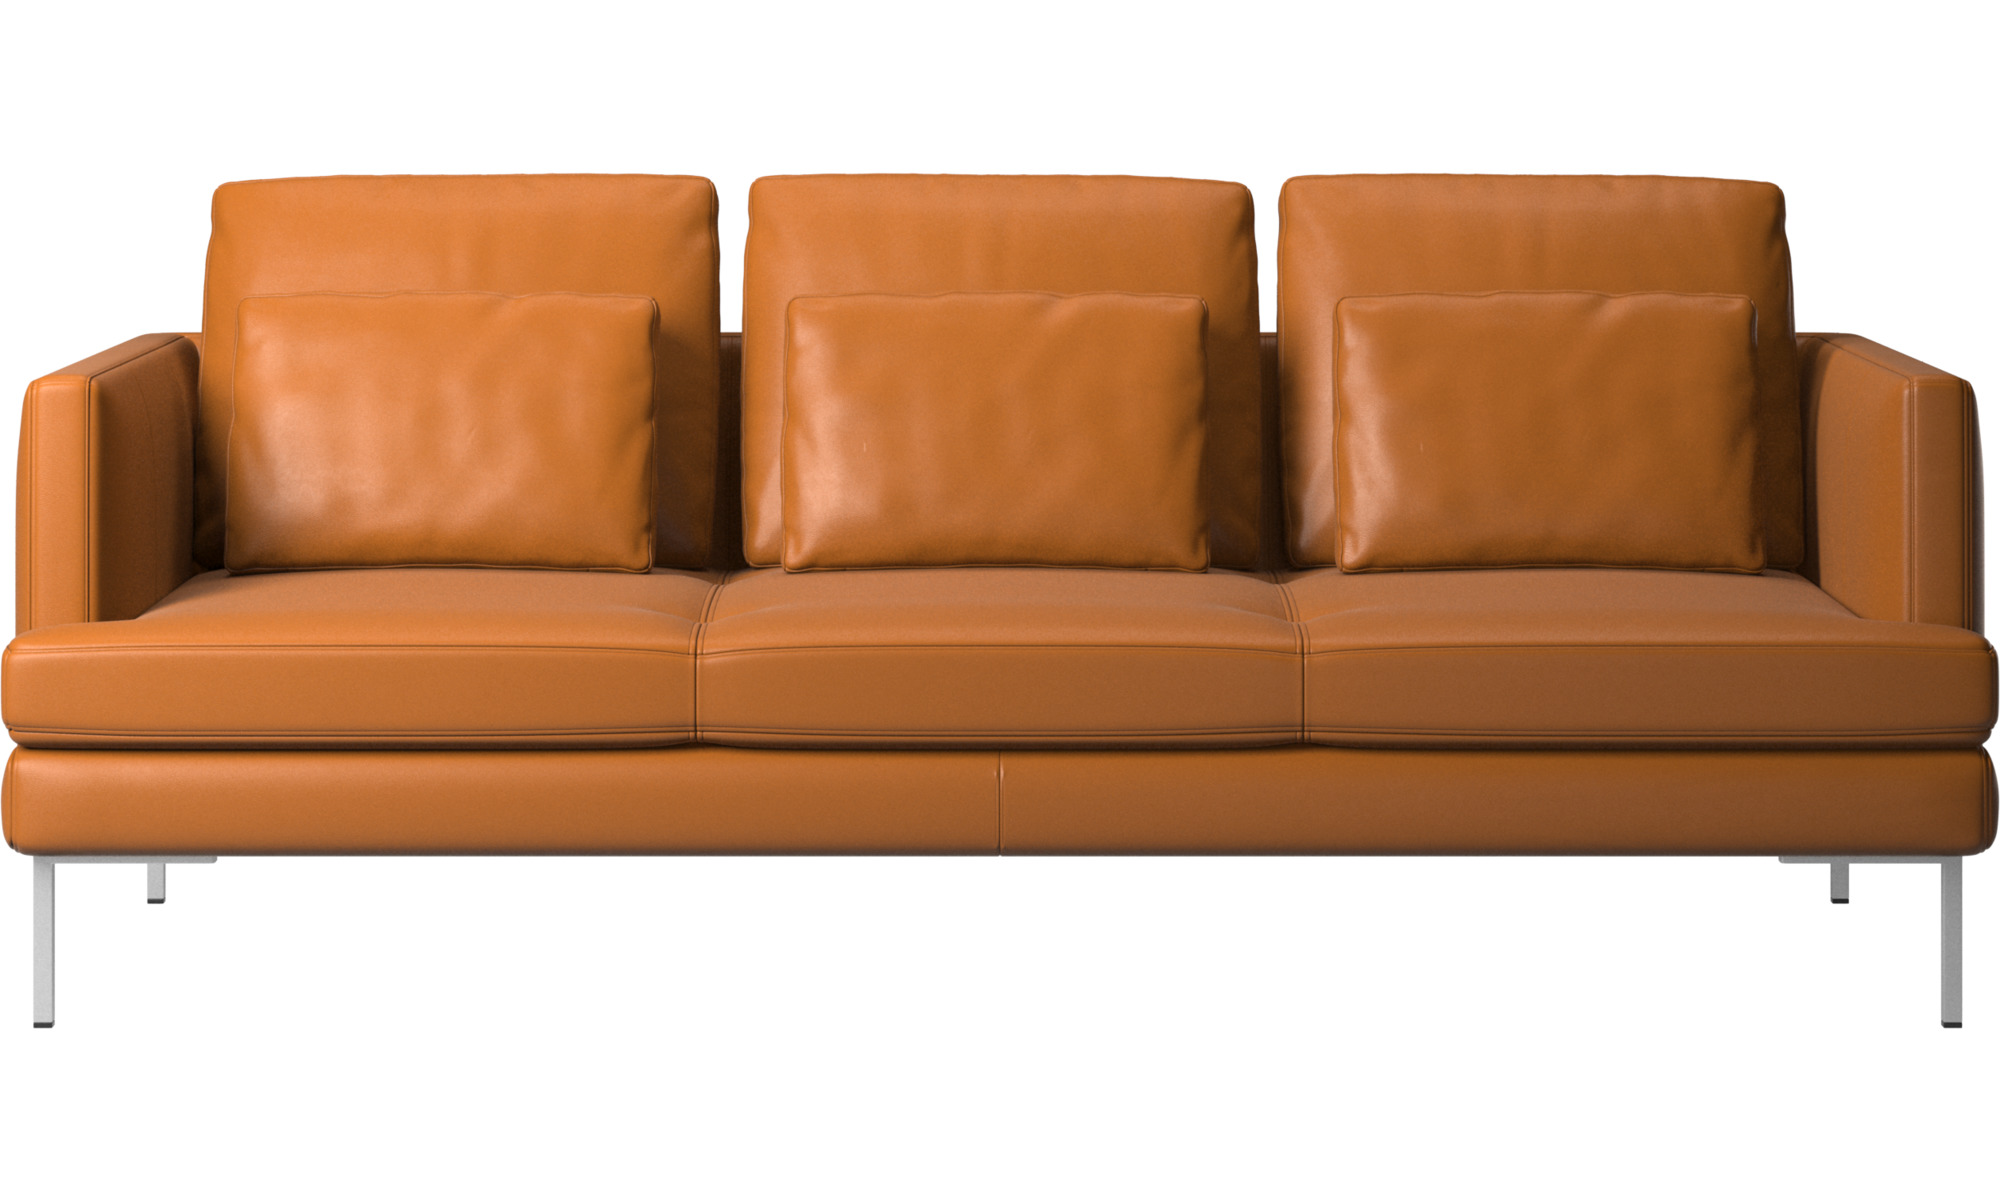 3 personers sofaer - Istra 2 sofa - Brun - Læder